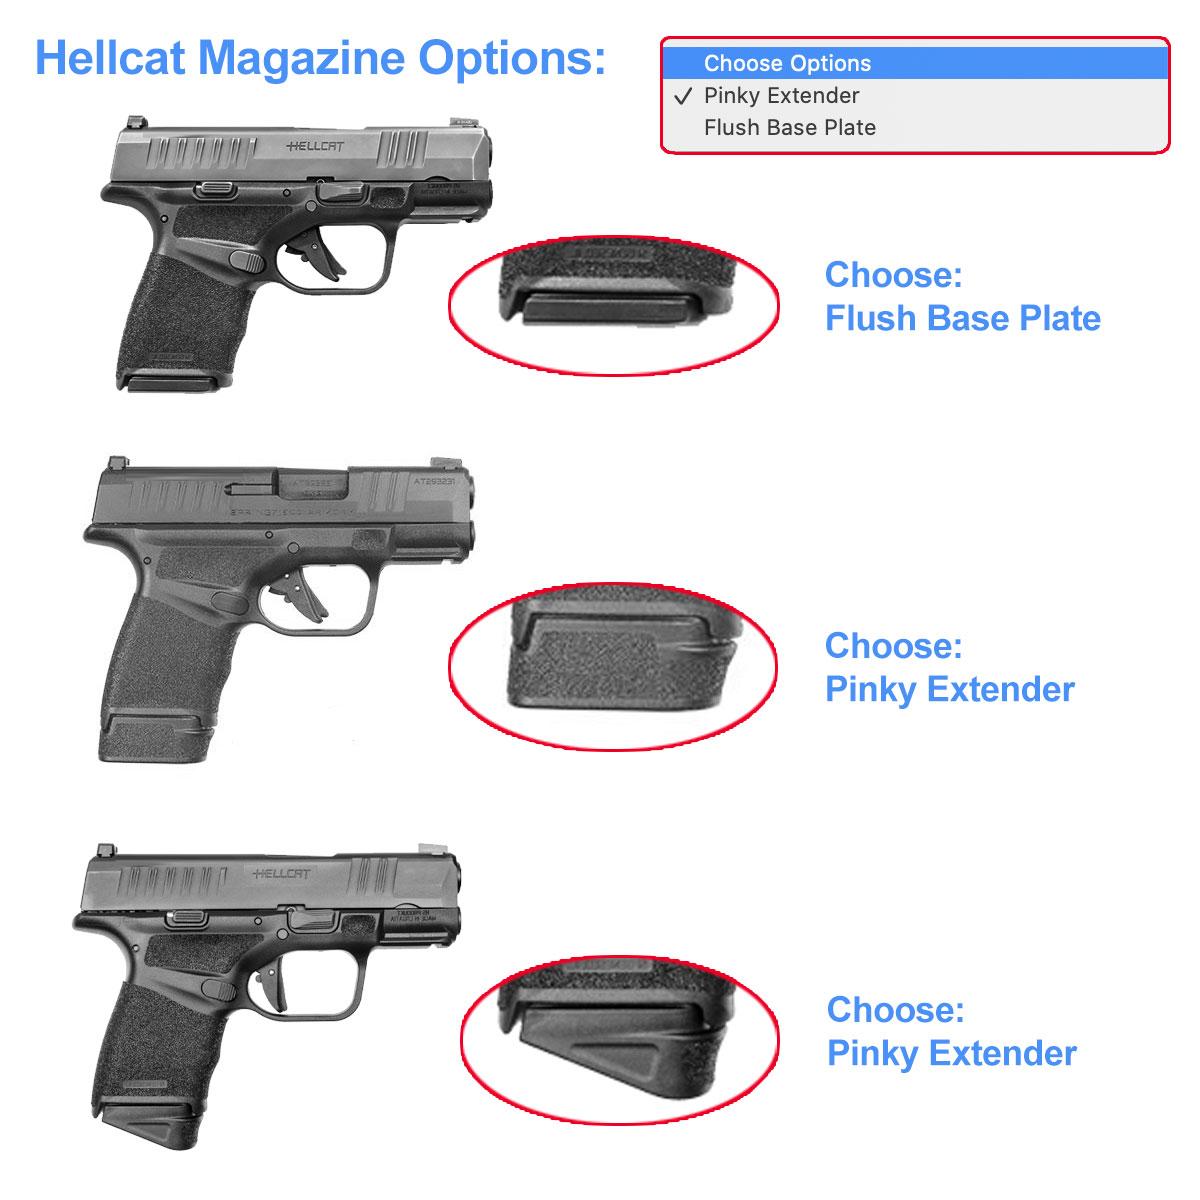 hellcat-magazine-options.jpg